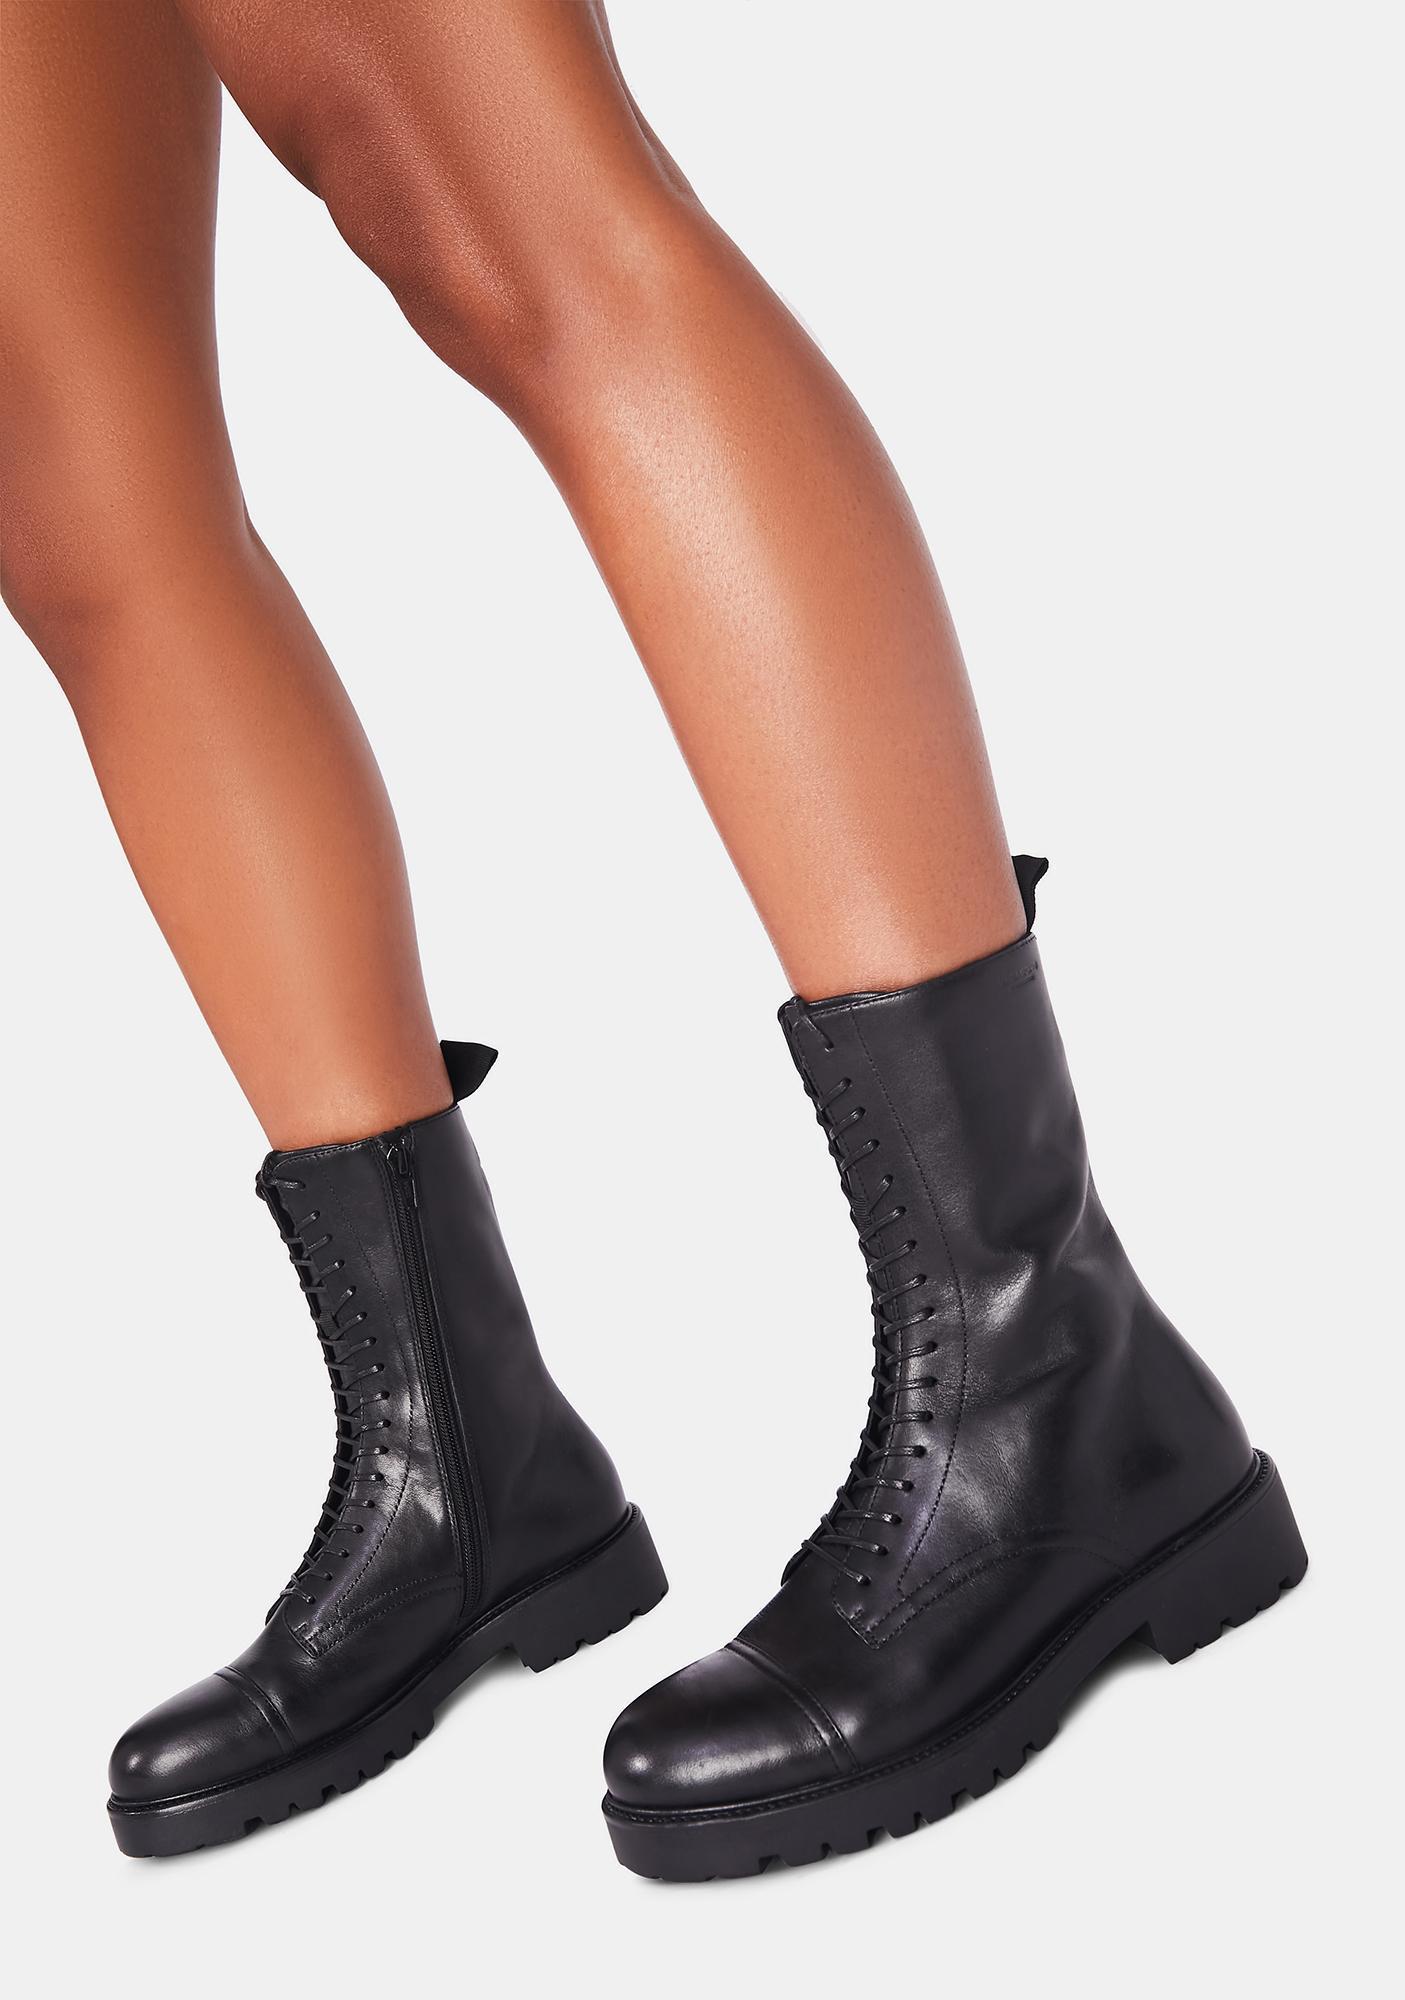 VAGABOND SHOEMAKERS Kenova Boots